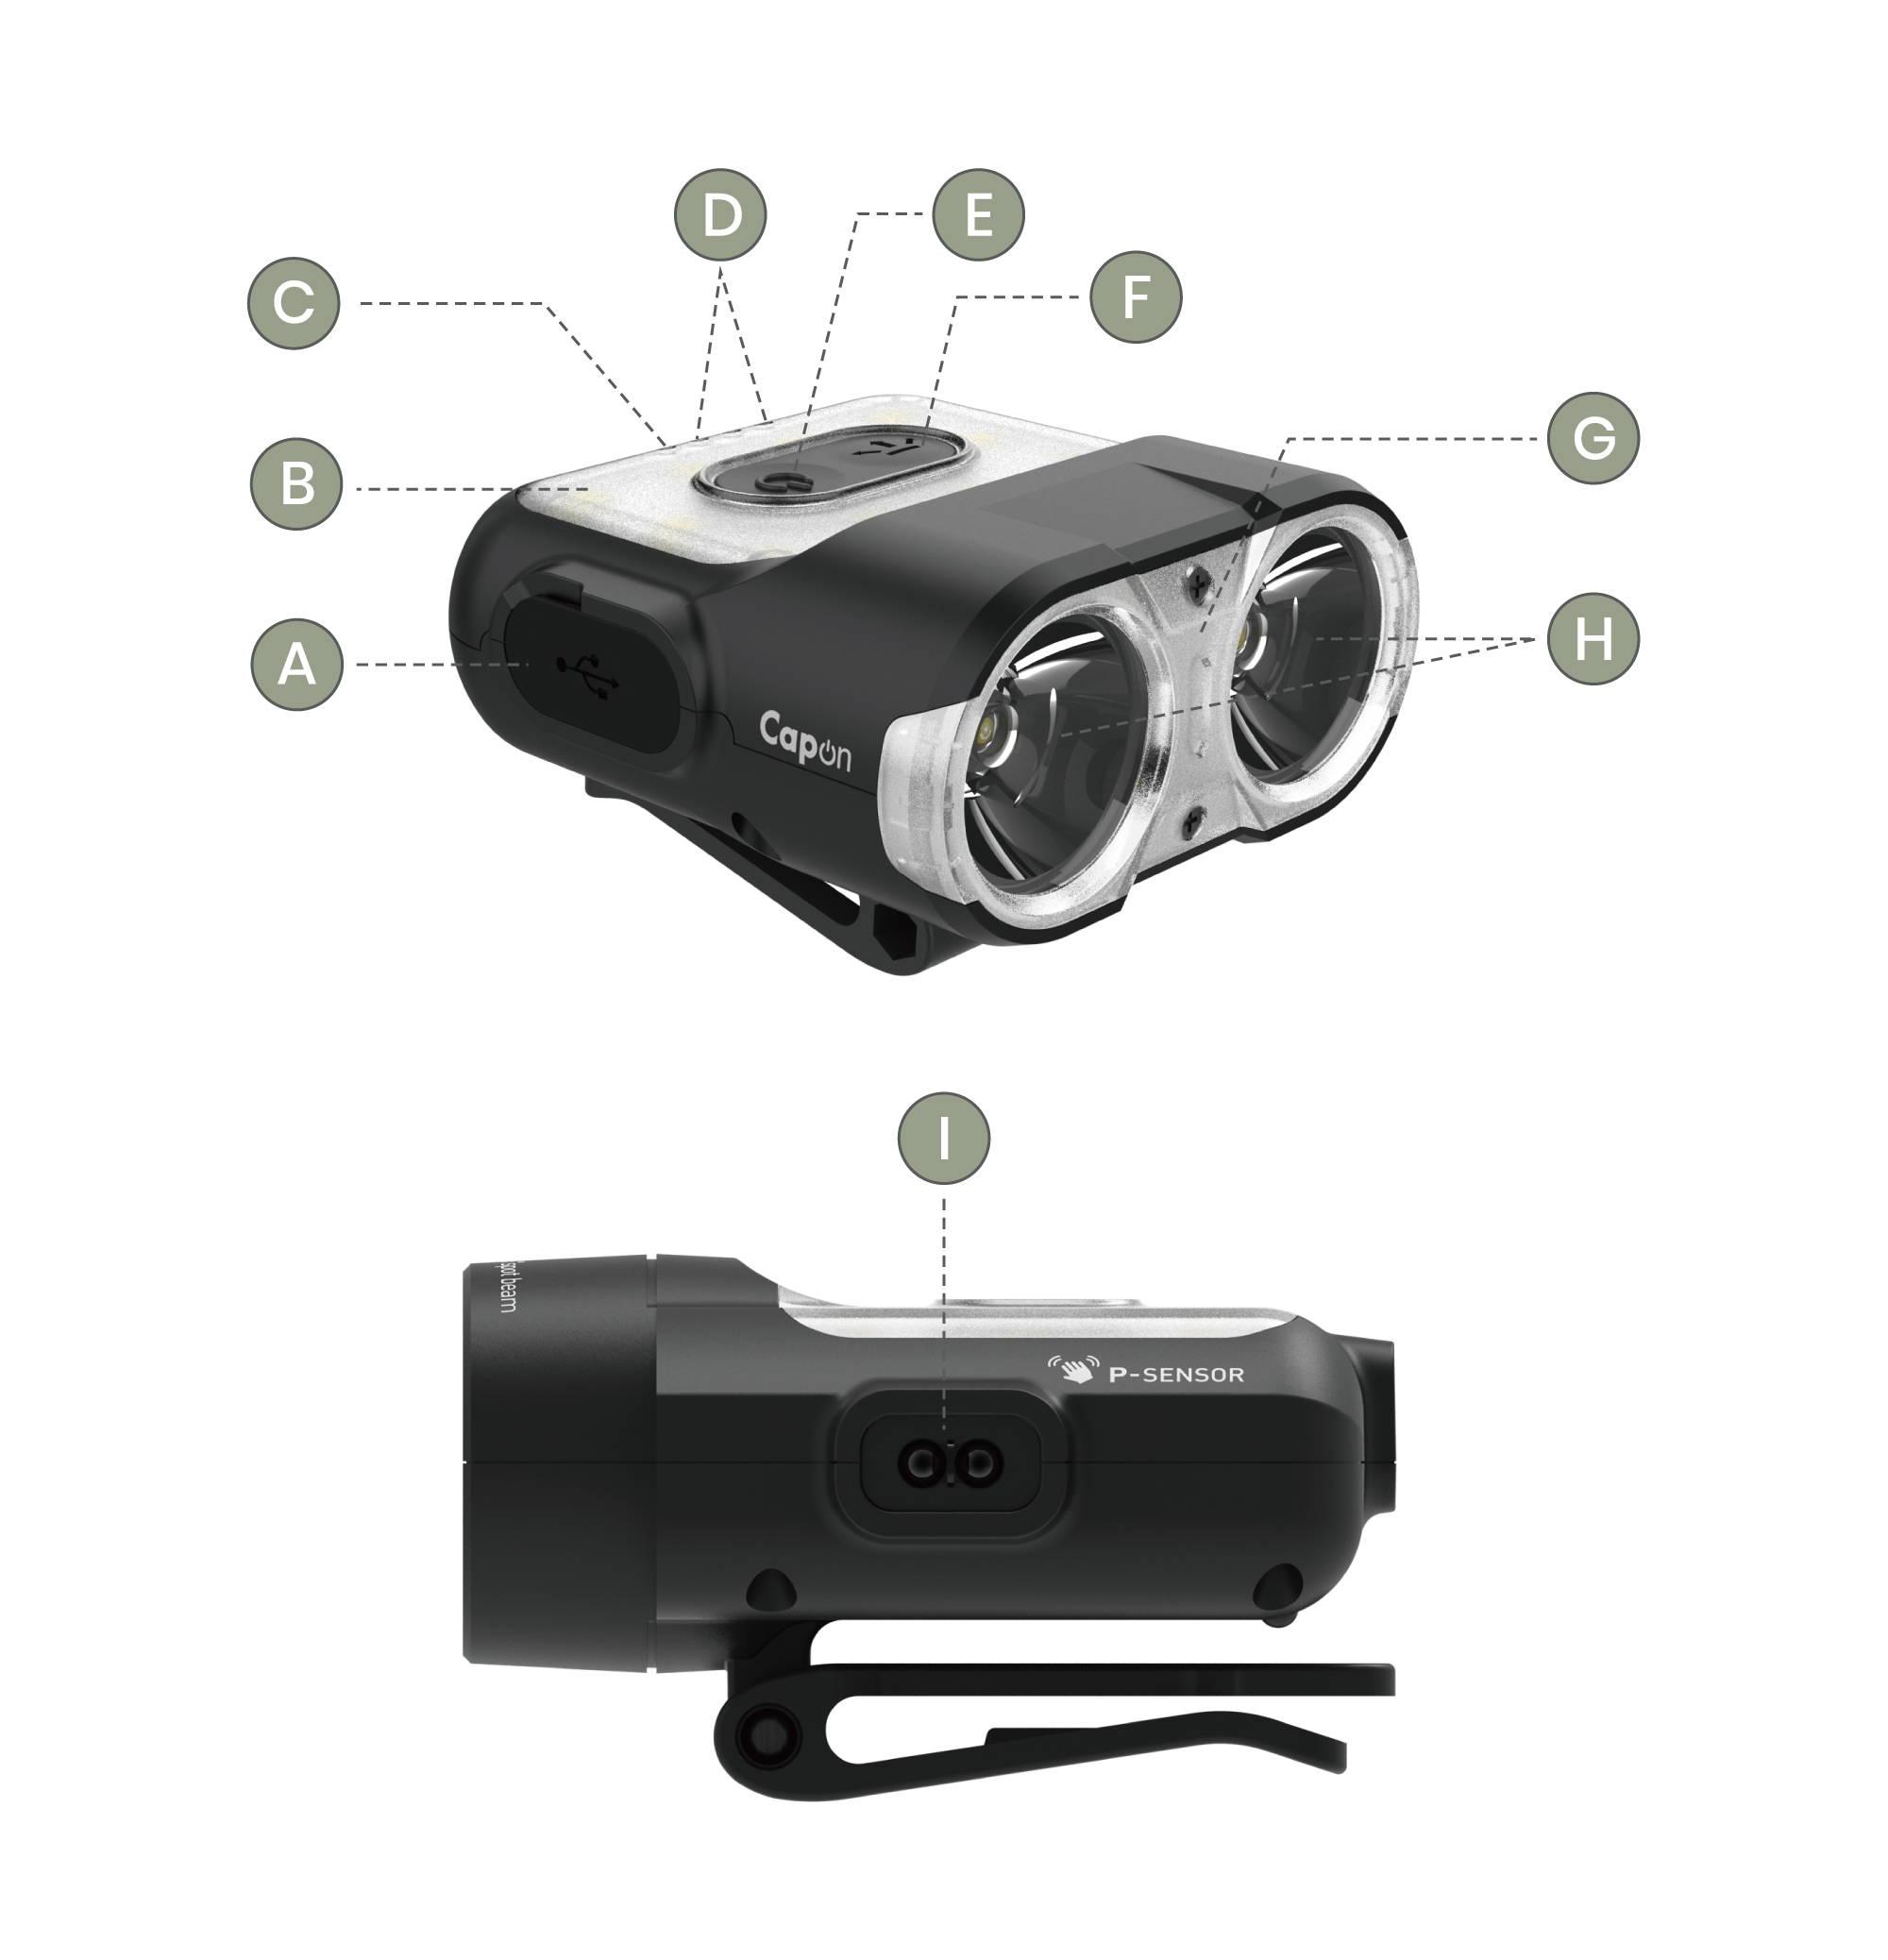 Cap Light / caplight / Head Light / Headlight / Capon / Canada Light / Motion Sensor / Motion sensor light